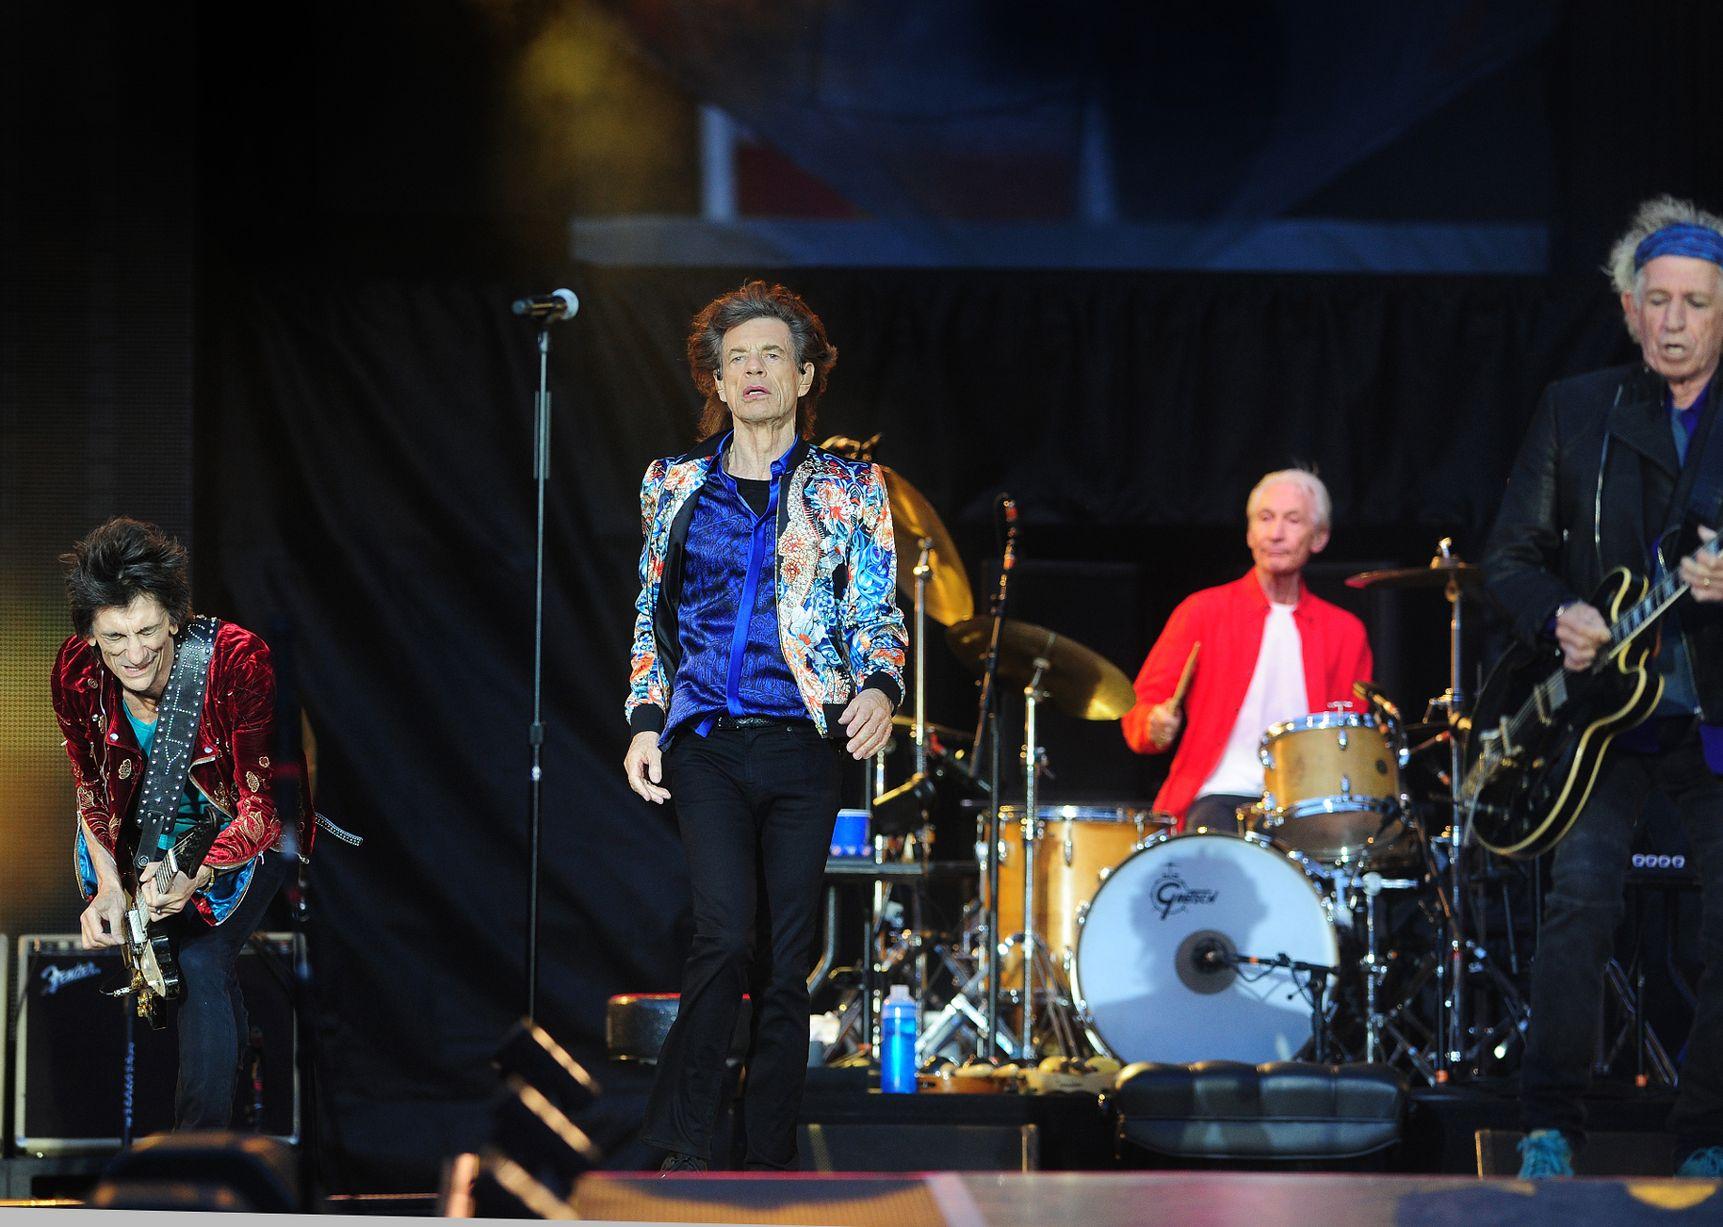 Rolling Stones - News, views, gossip, pictures, video - Mirror Online Rolling stones pictures 2018